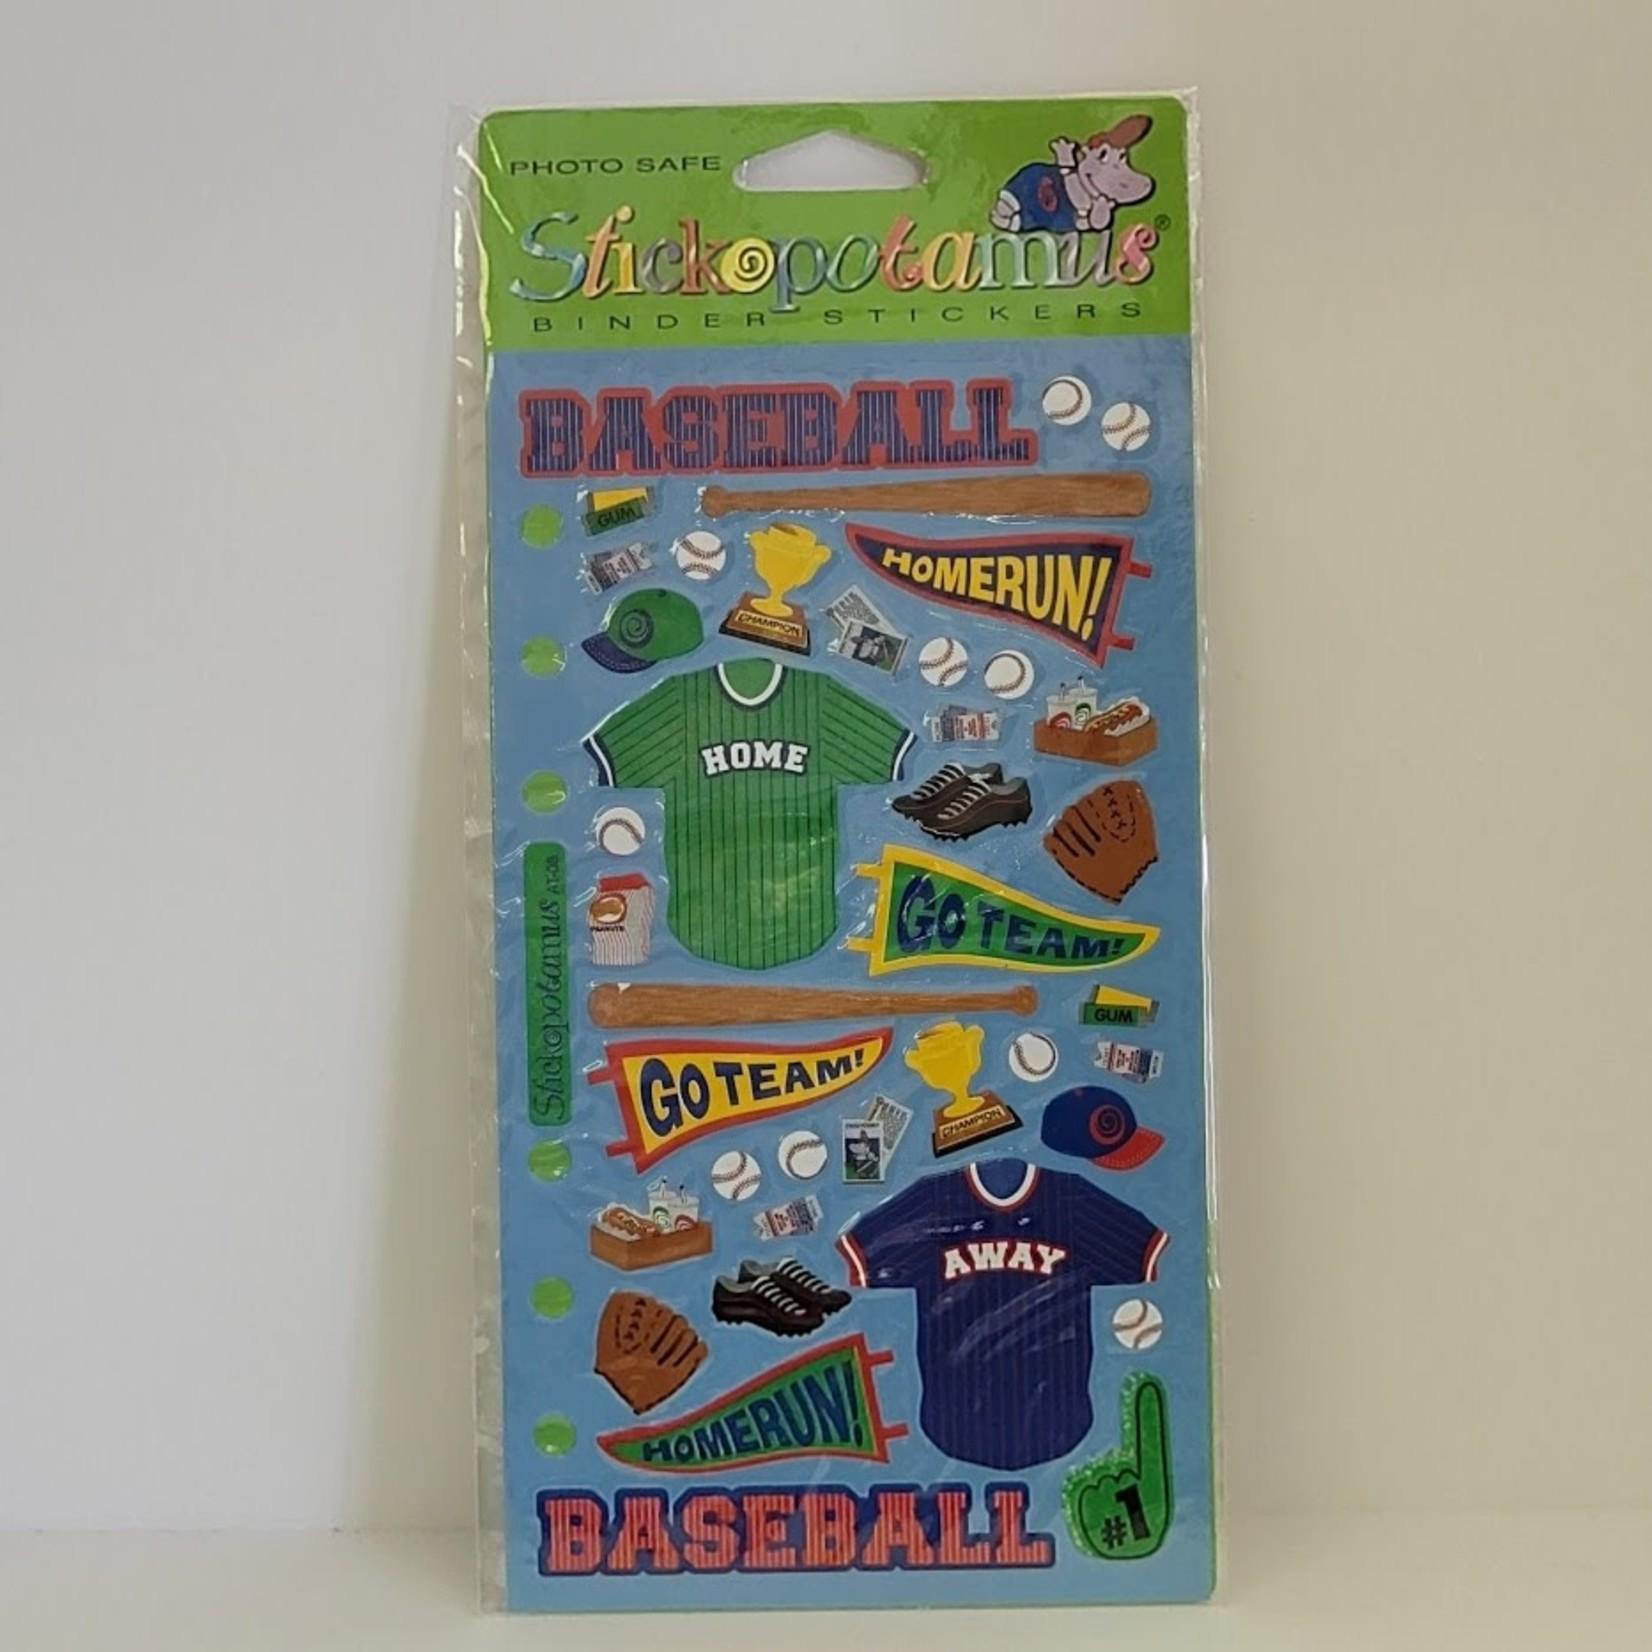 Stickoptamus - Stickers - Baseball